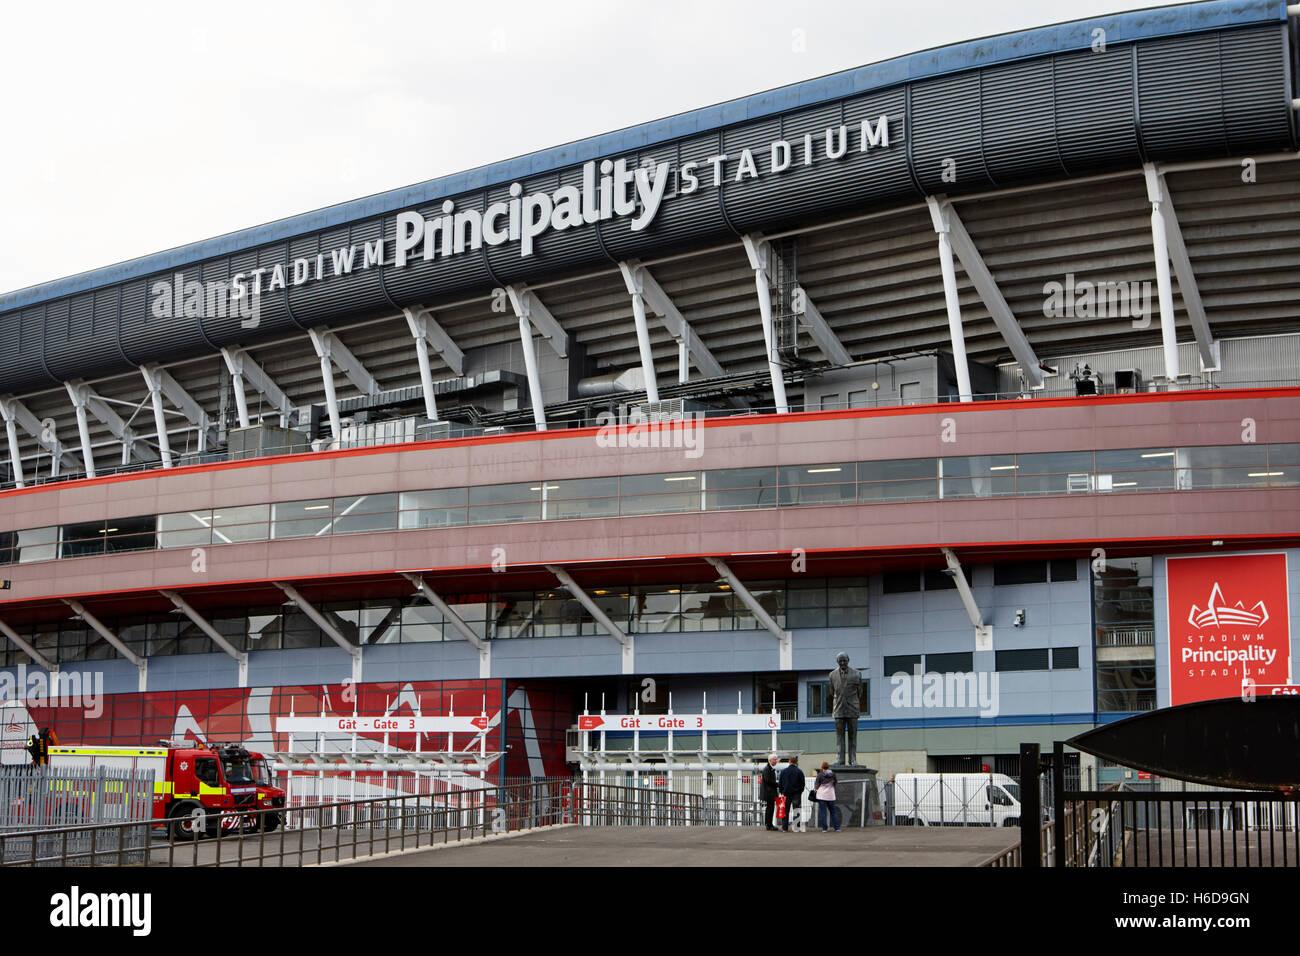 Principality former millennium stadium Cardiff Wales United Kingdom - Stock Image